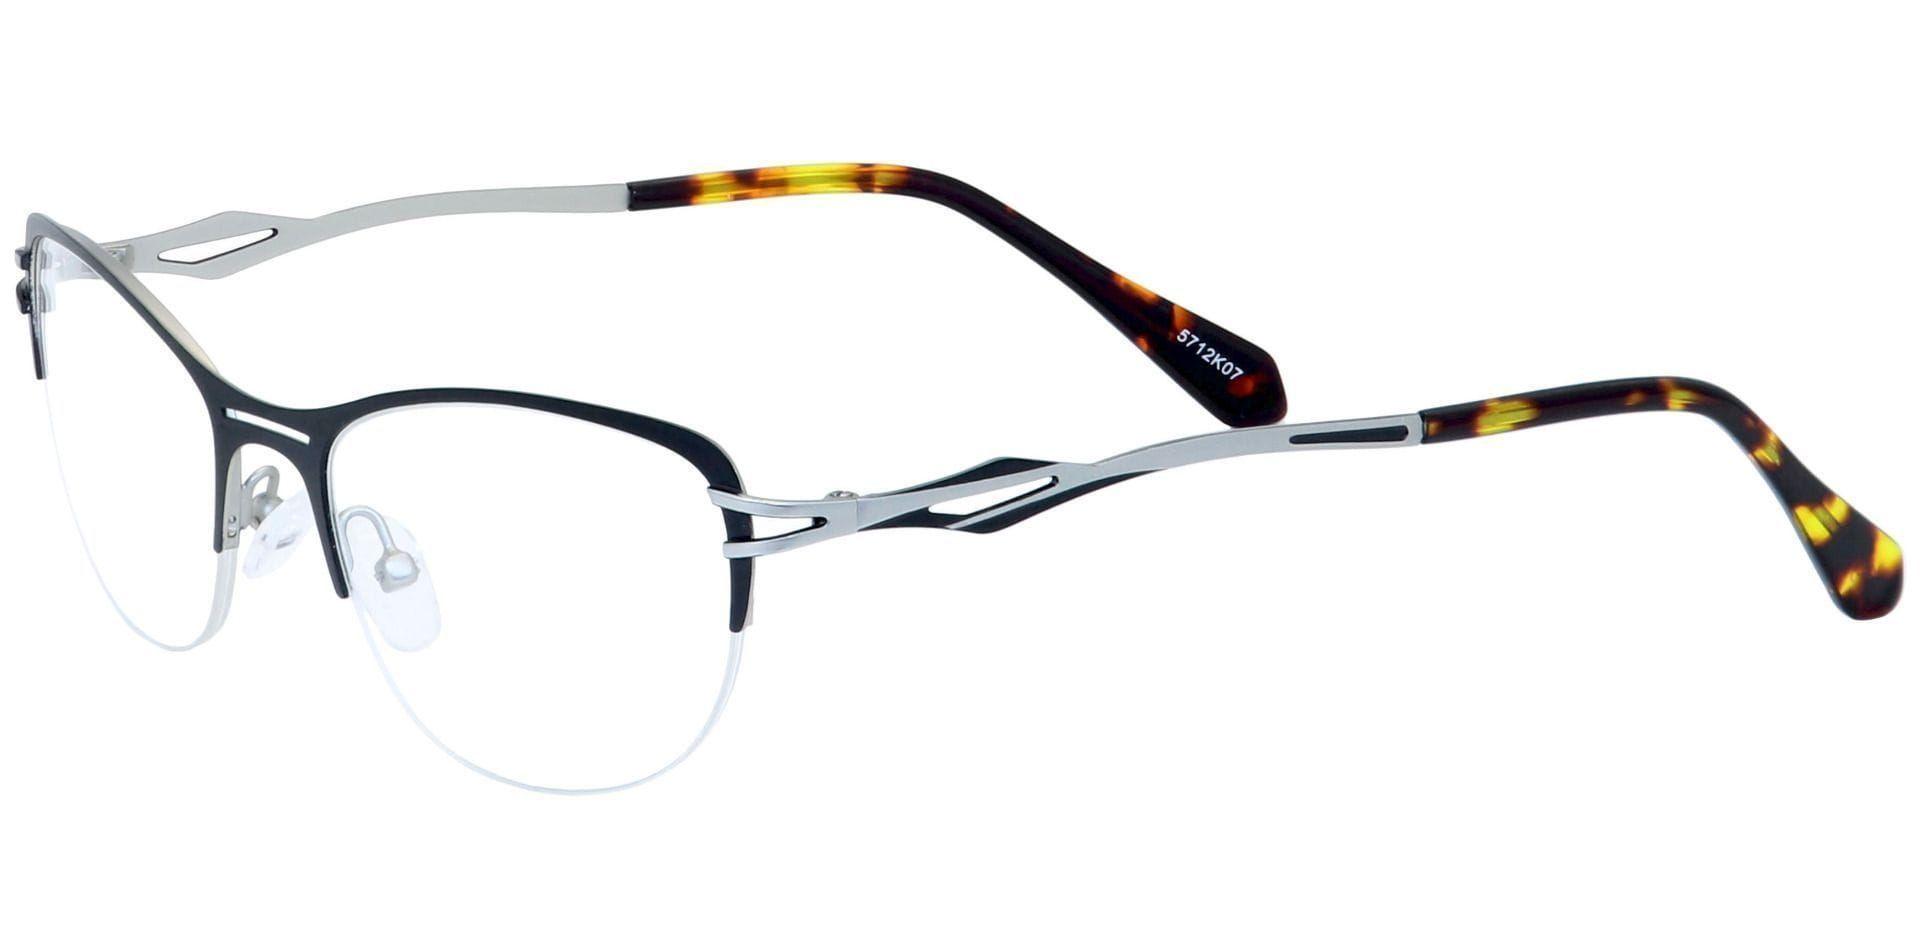 Cress Round Lined Bifocal Glasses - Black